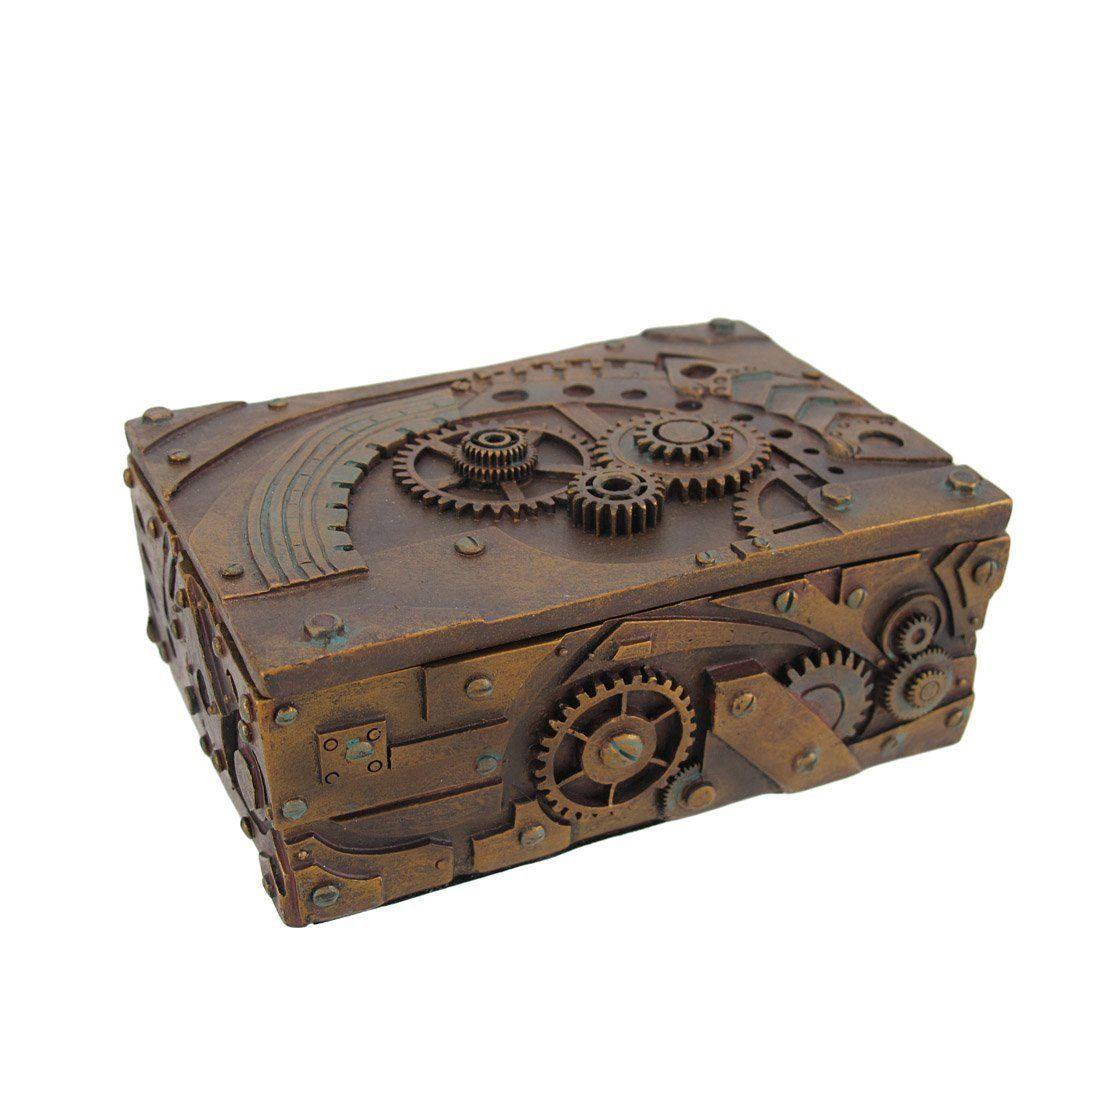 new steampunk trinket jewelry box steam punk stash objets scrap pinterest steampunk. Black Bedroom Furniture Sets. Home Design Ideas